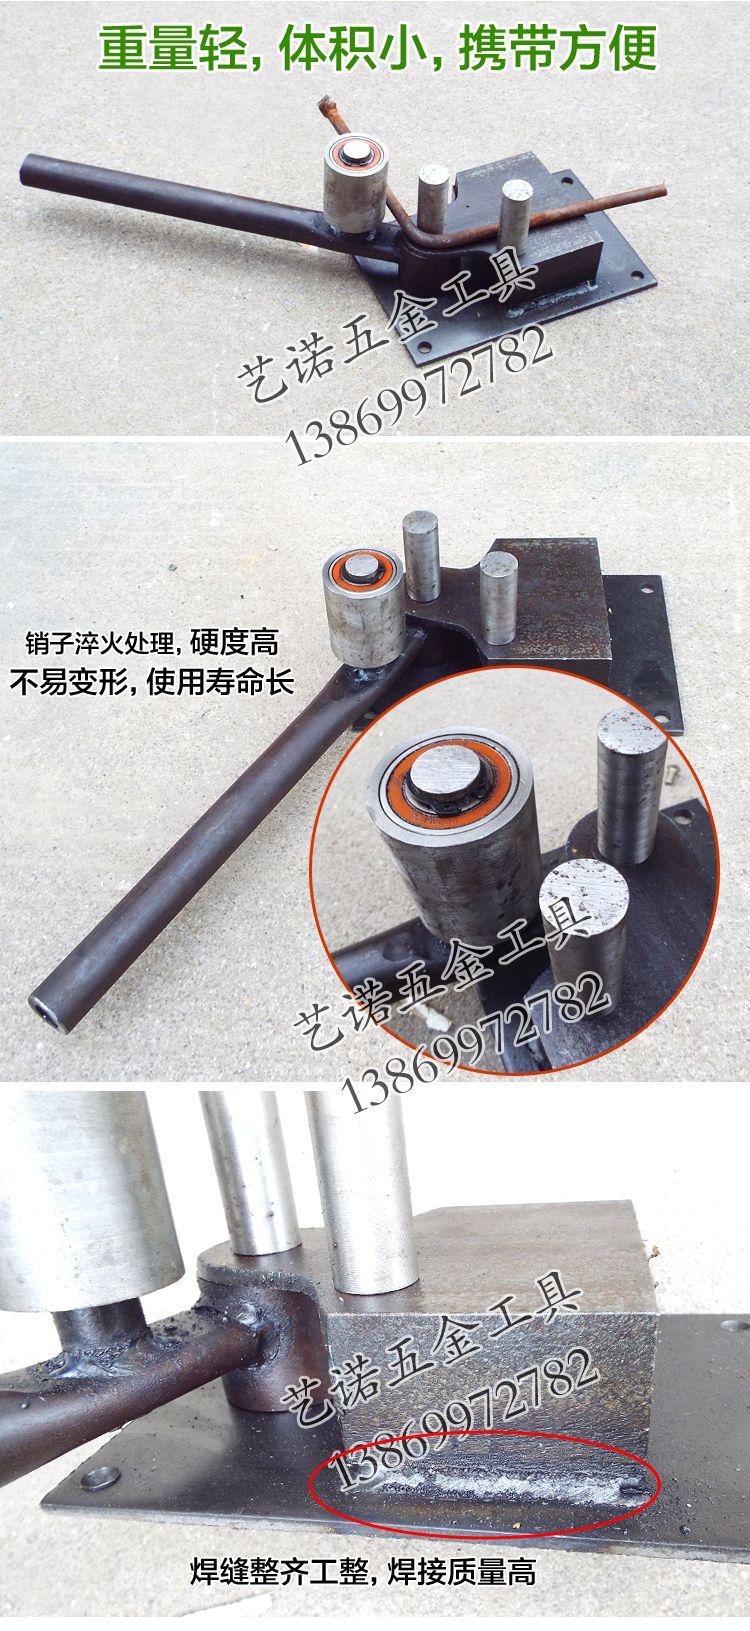 Building manual pull rebar bending angle bending machine reinforced steel  bars robot move stirrups bending machine - Taobao global Station